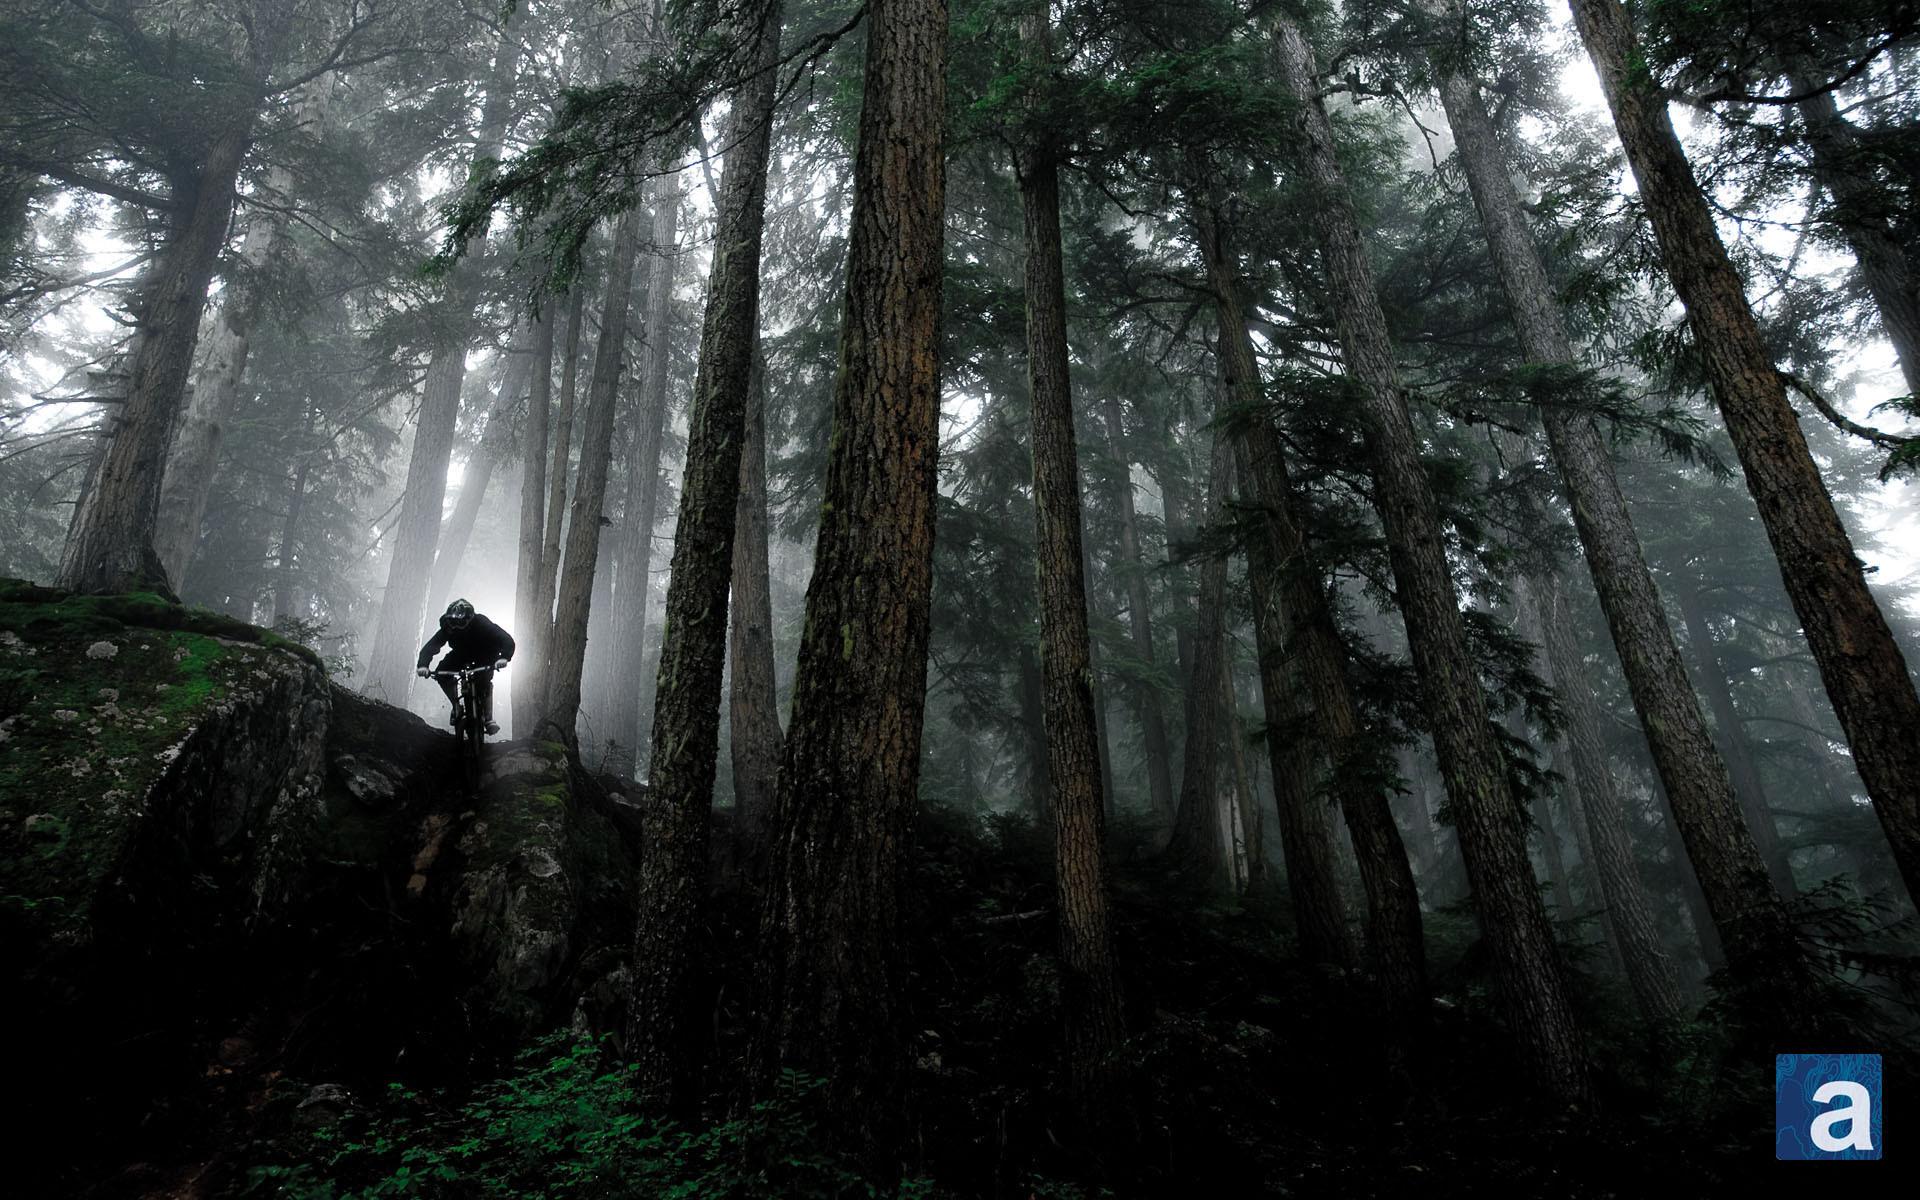 Downhill Mountain Bike Wallpaper (67+ images)